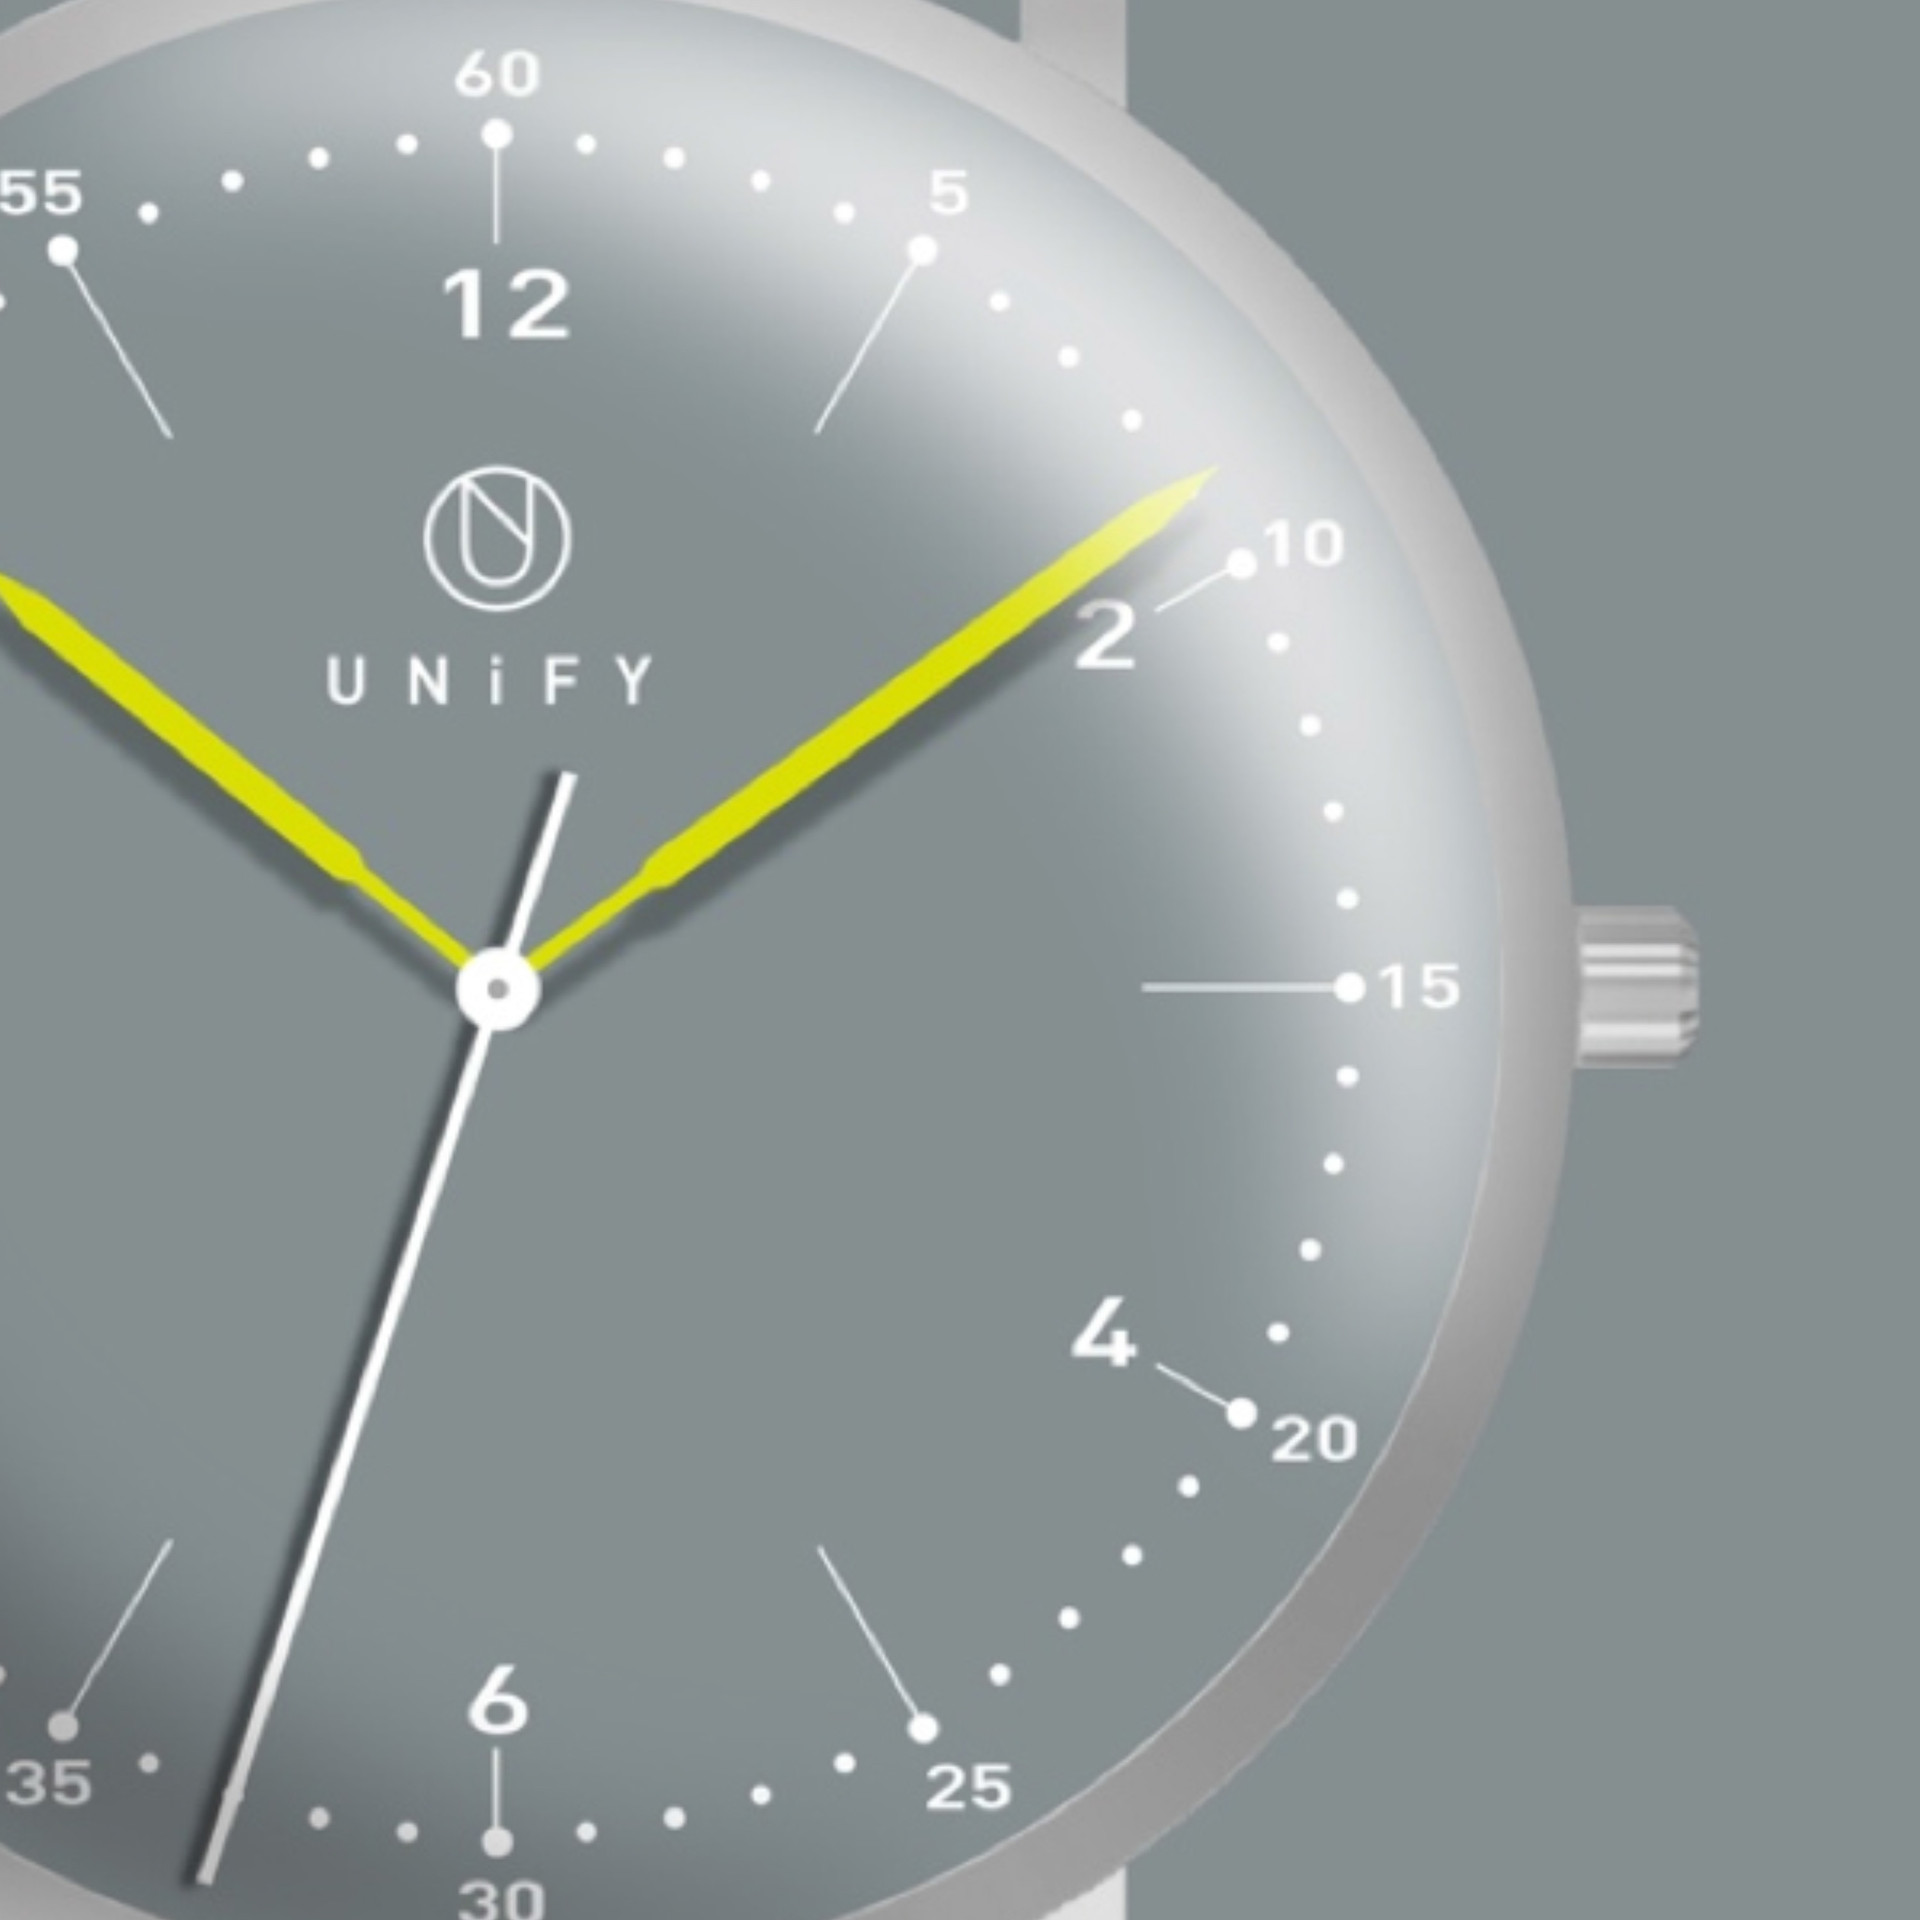 Unify01.jpg